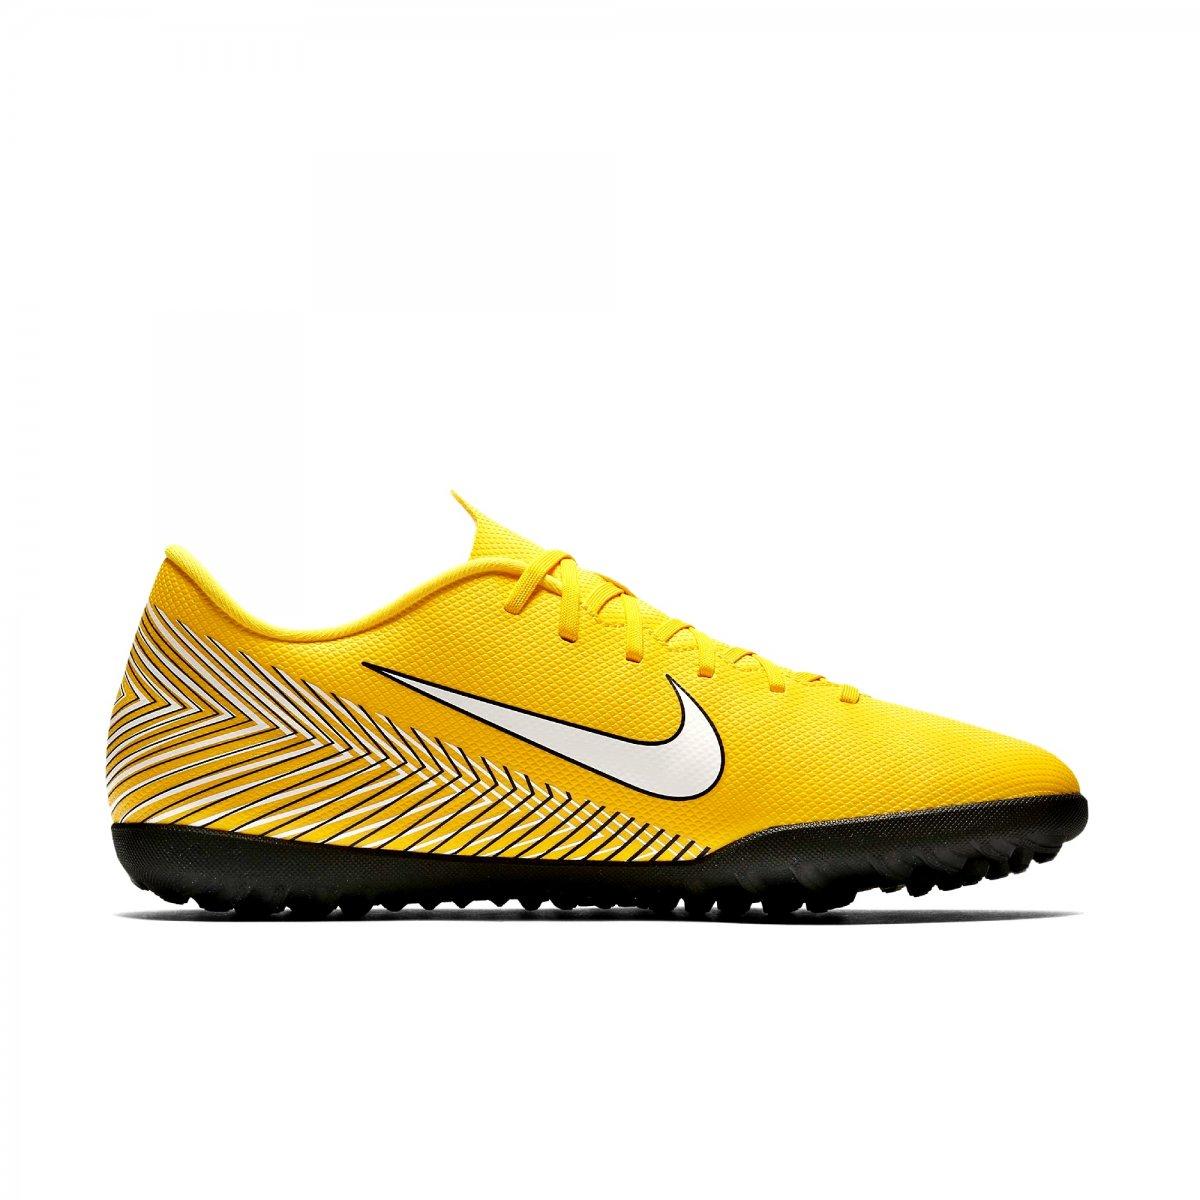 37da8960e8 Chuteira Society Nike MercurialX Vapor VII Neymar AO3119-710 ...